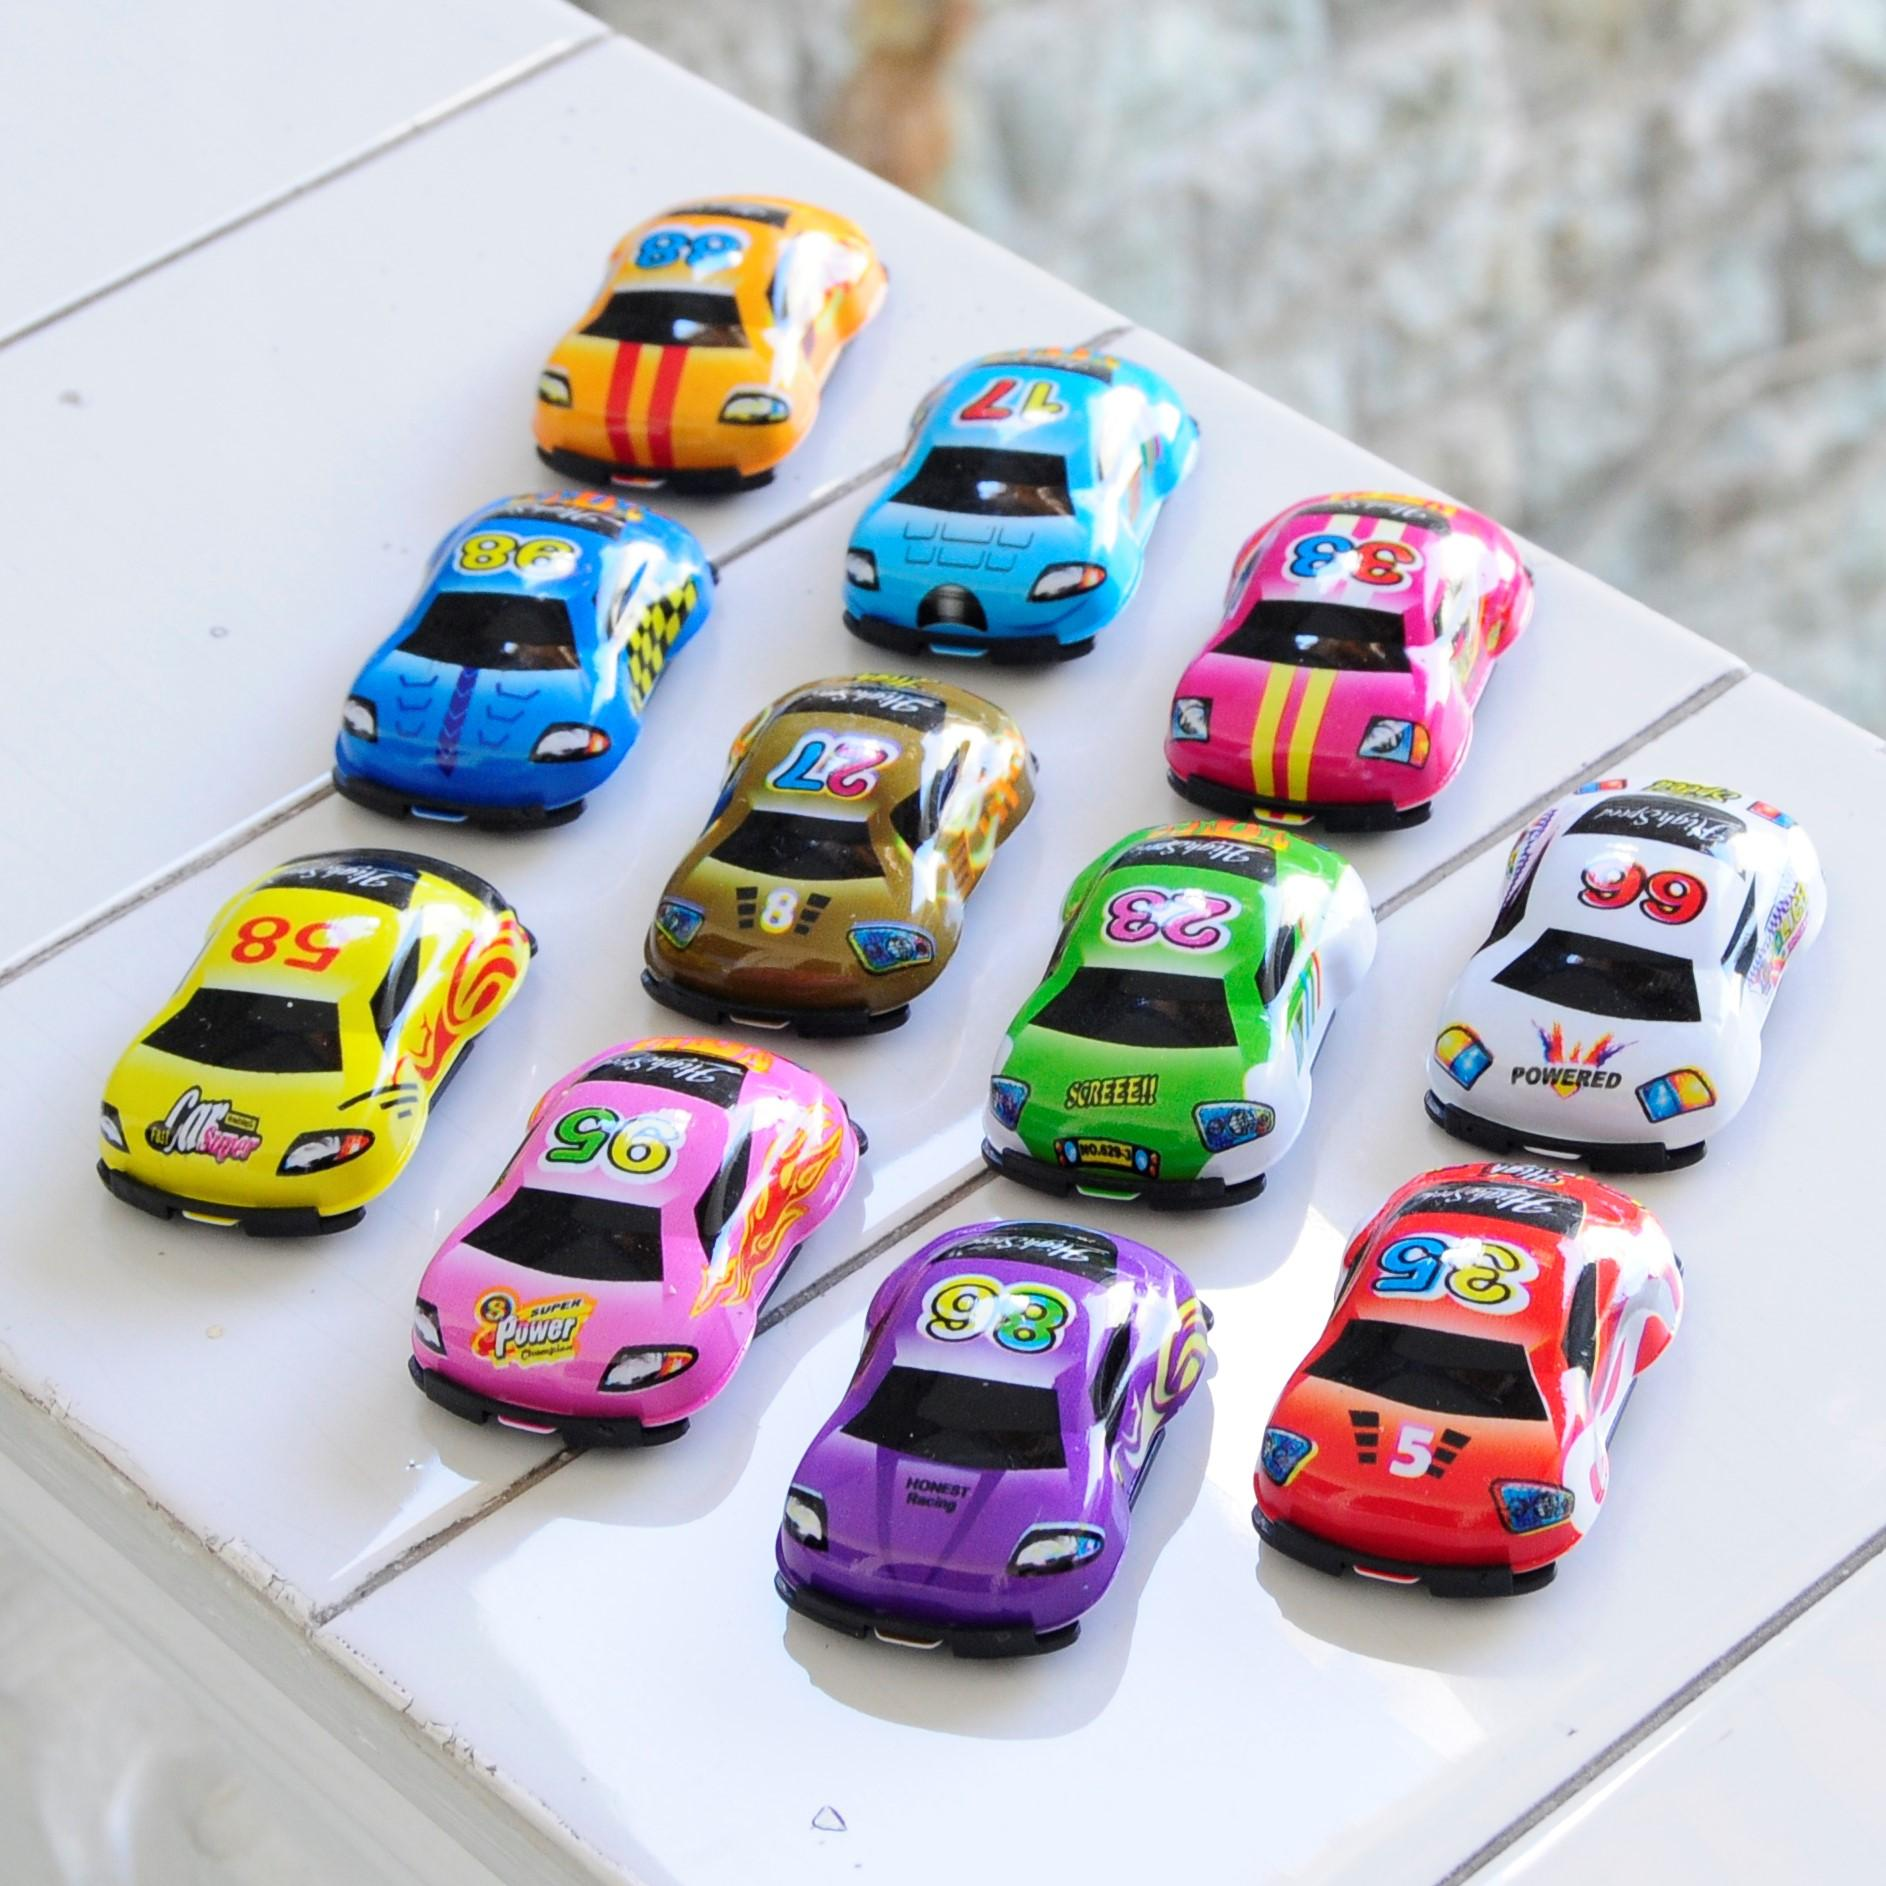 Mainan Pullback Mobil Balap Mobil Mobilan Car Toys Toy Lazada Indonesia